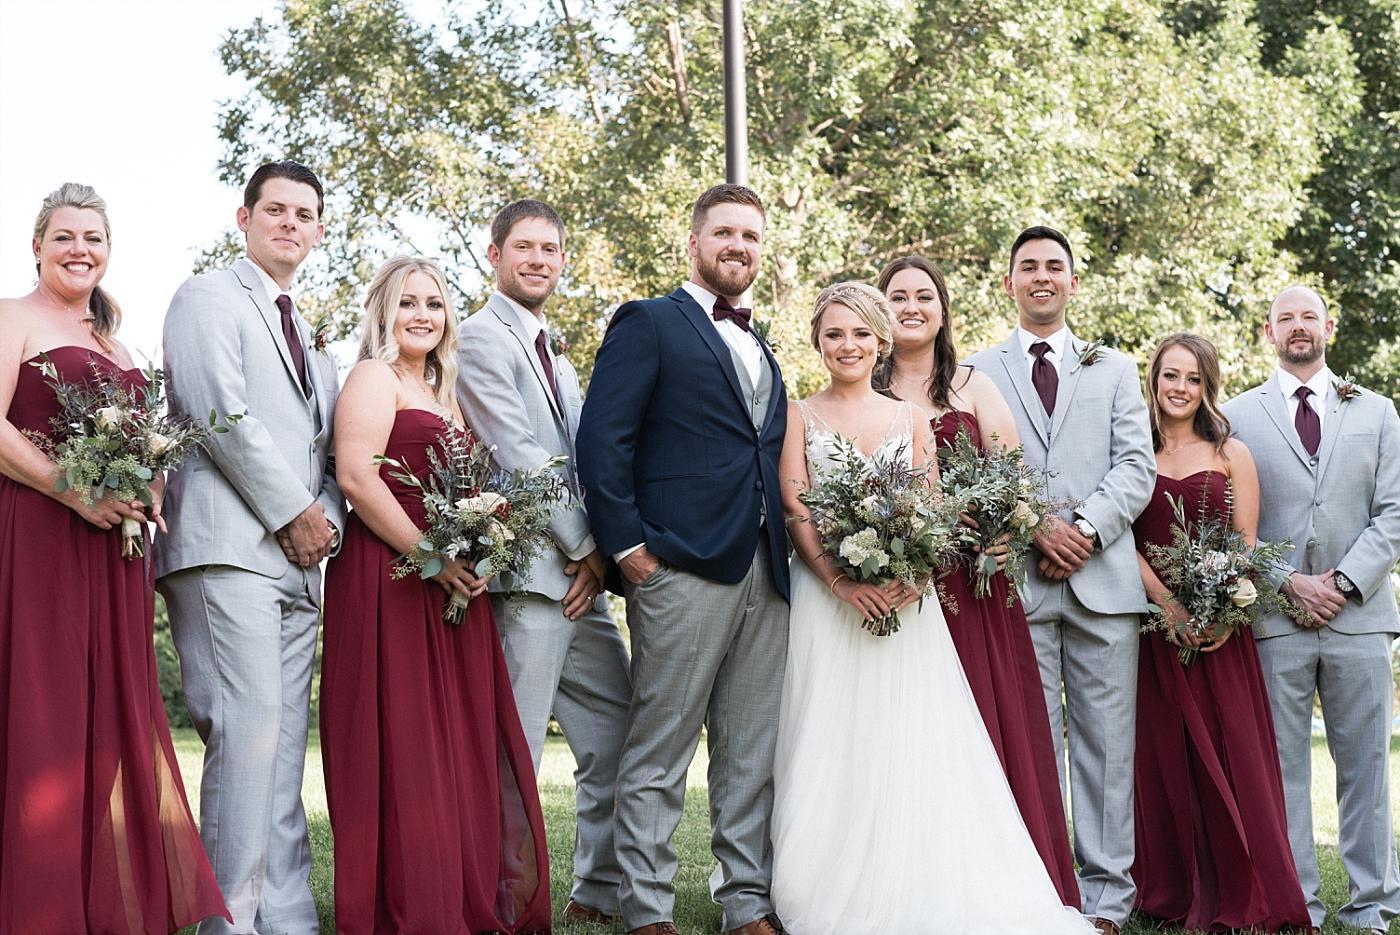 Bridal party wedding photography bridesmaid groomsmen